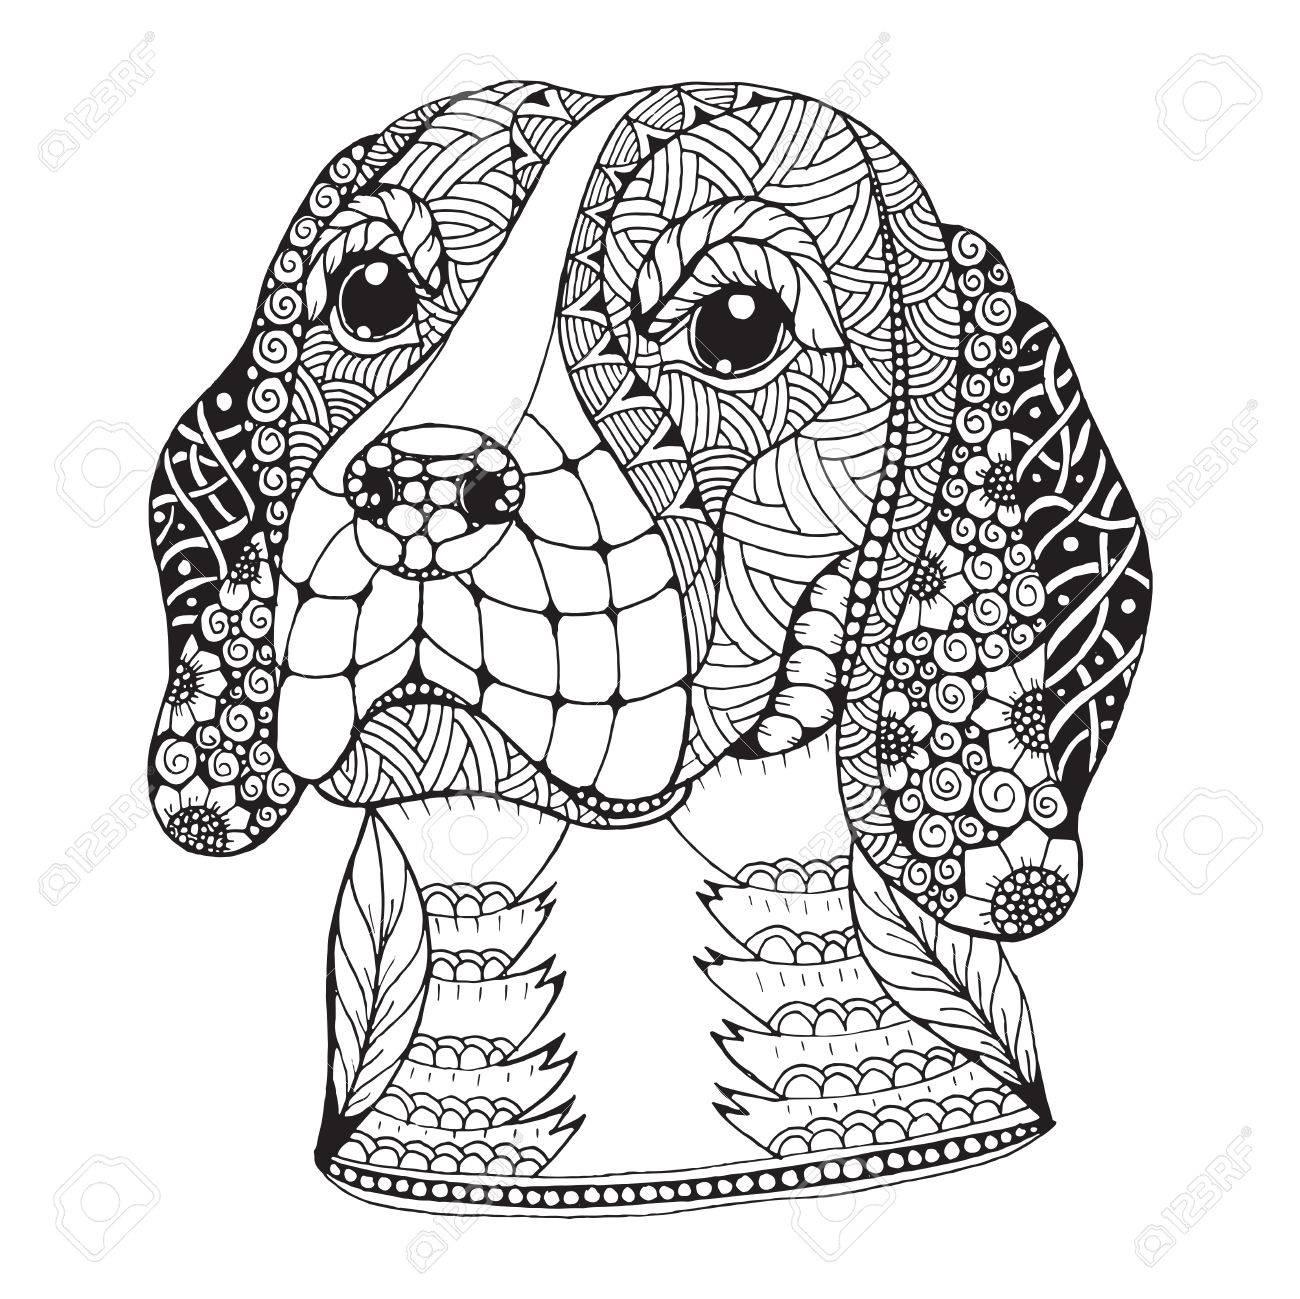 1300x1299 Beagle Dog Head Stylized, Illustration, Freehand Pencil, Hand